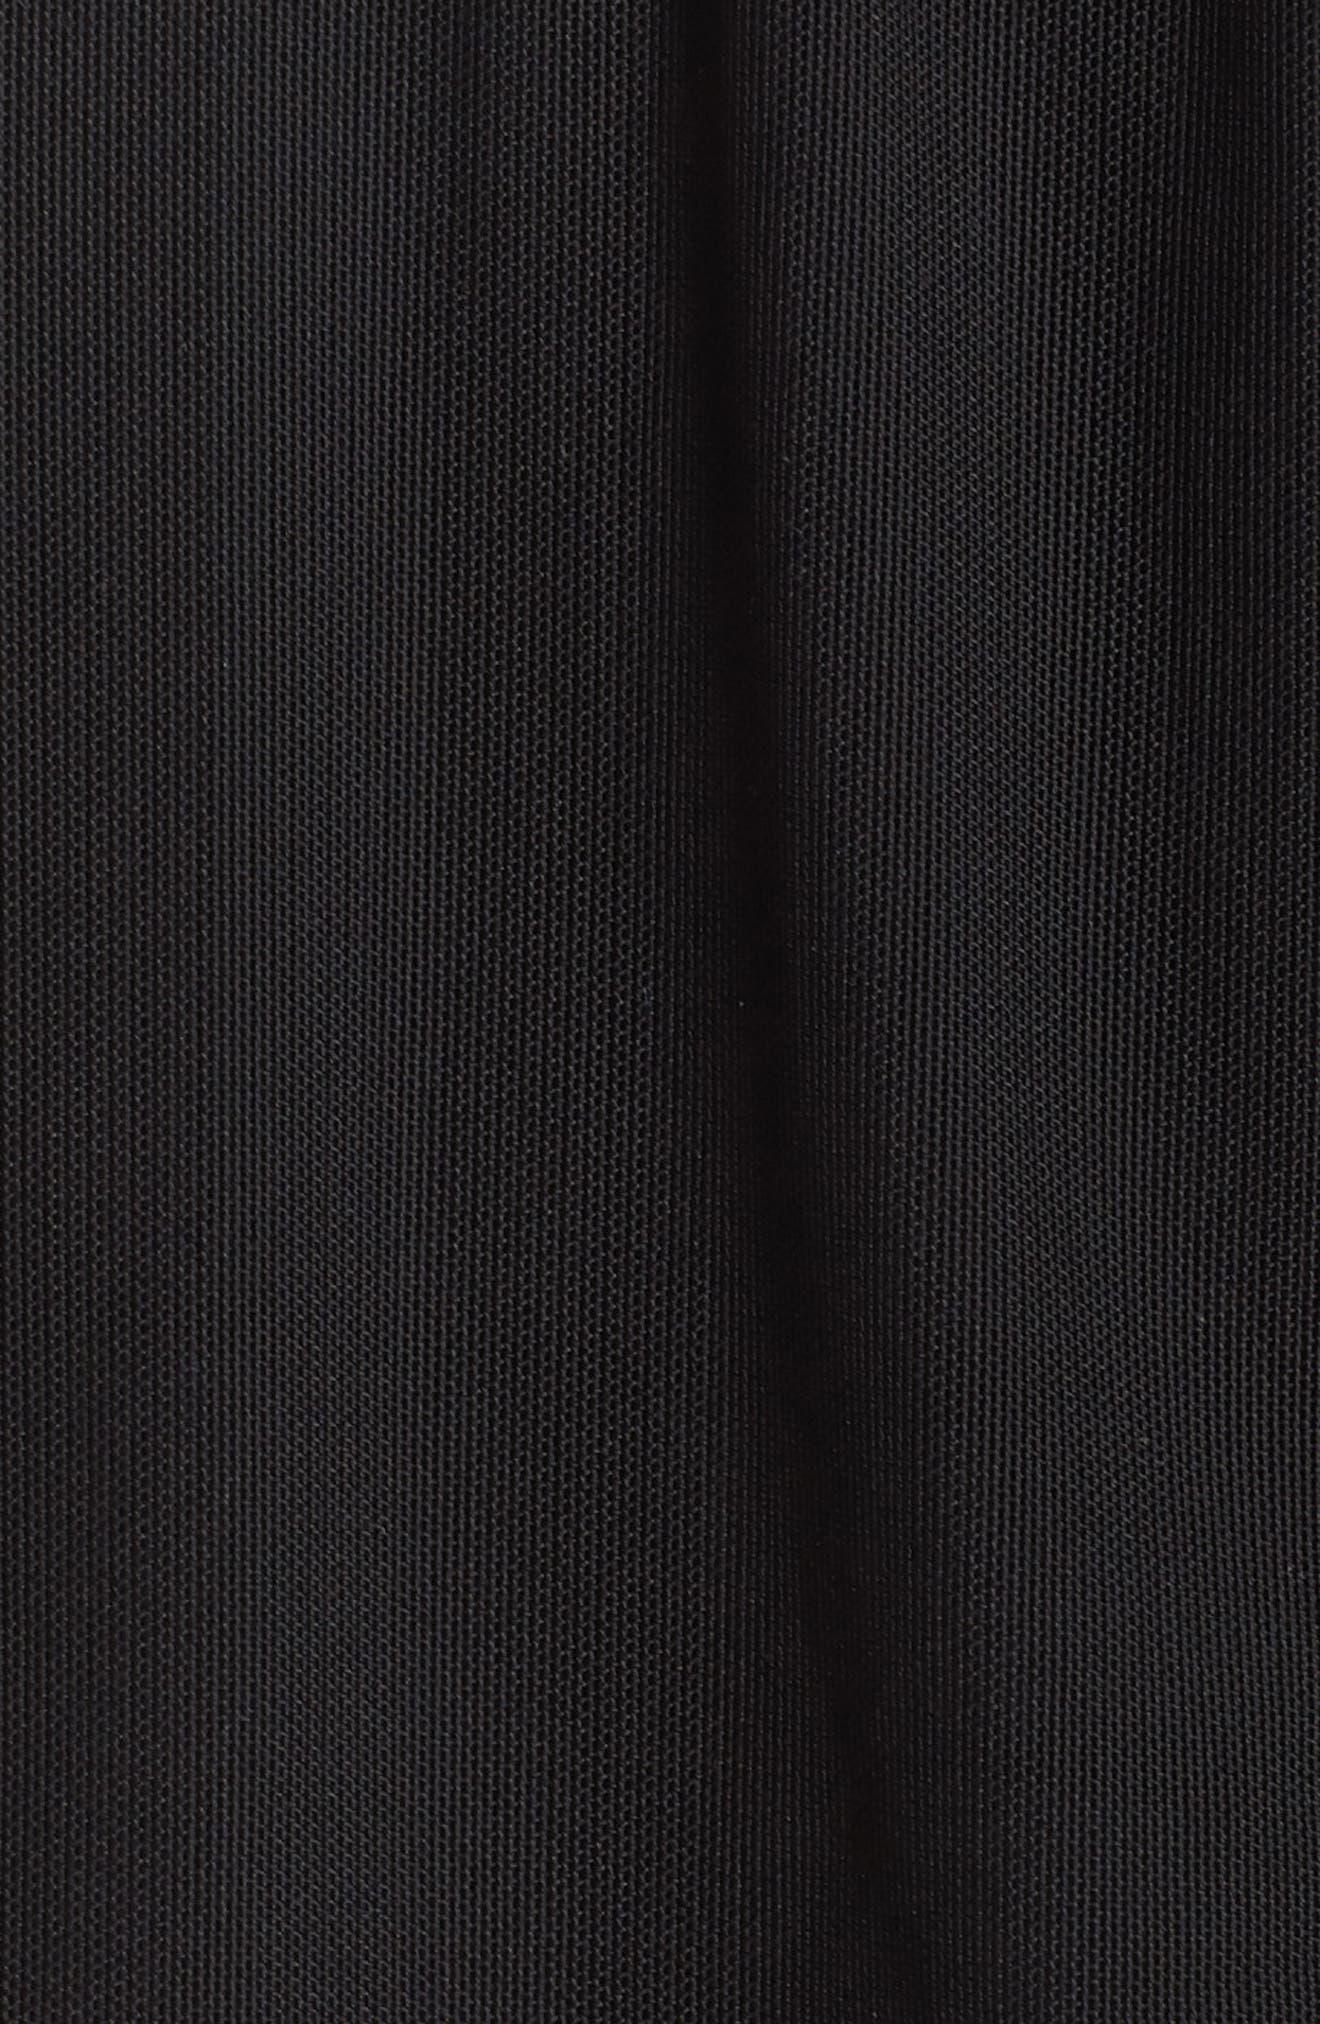 Ambience Shorts,                             Alternate thumbnail 6, color,                             BLACK/ BLACK/ ALO/ WHITE